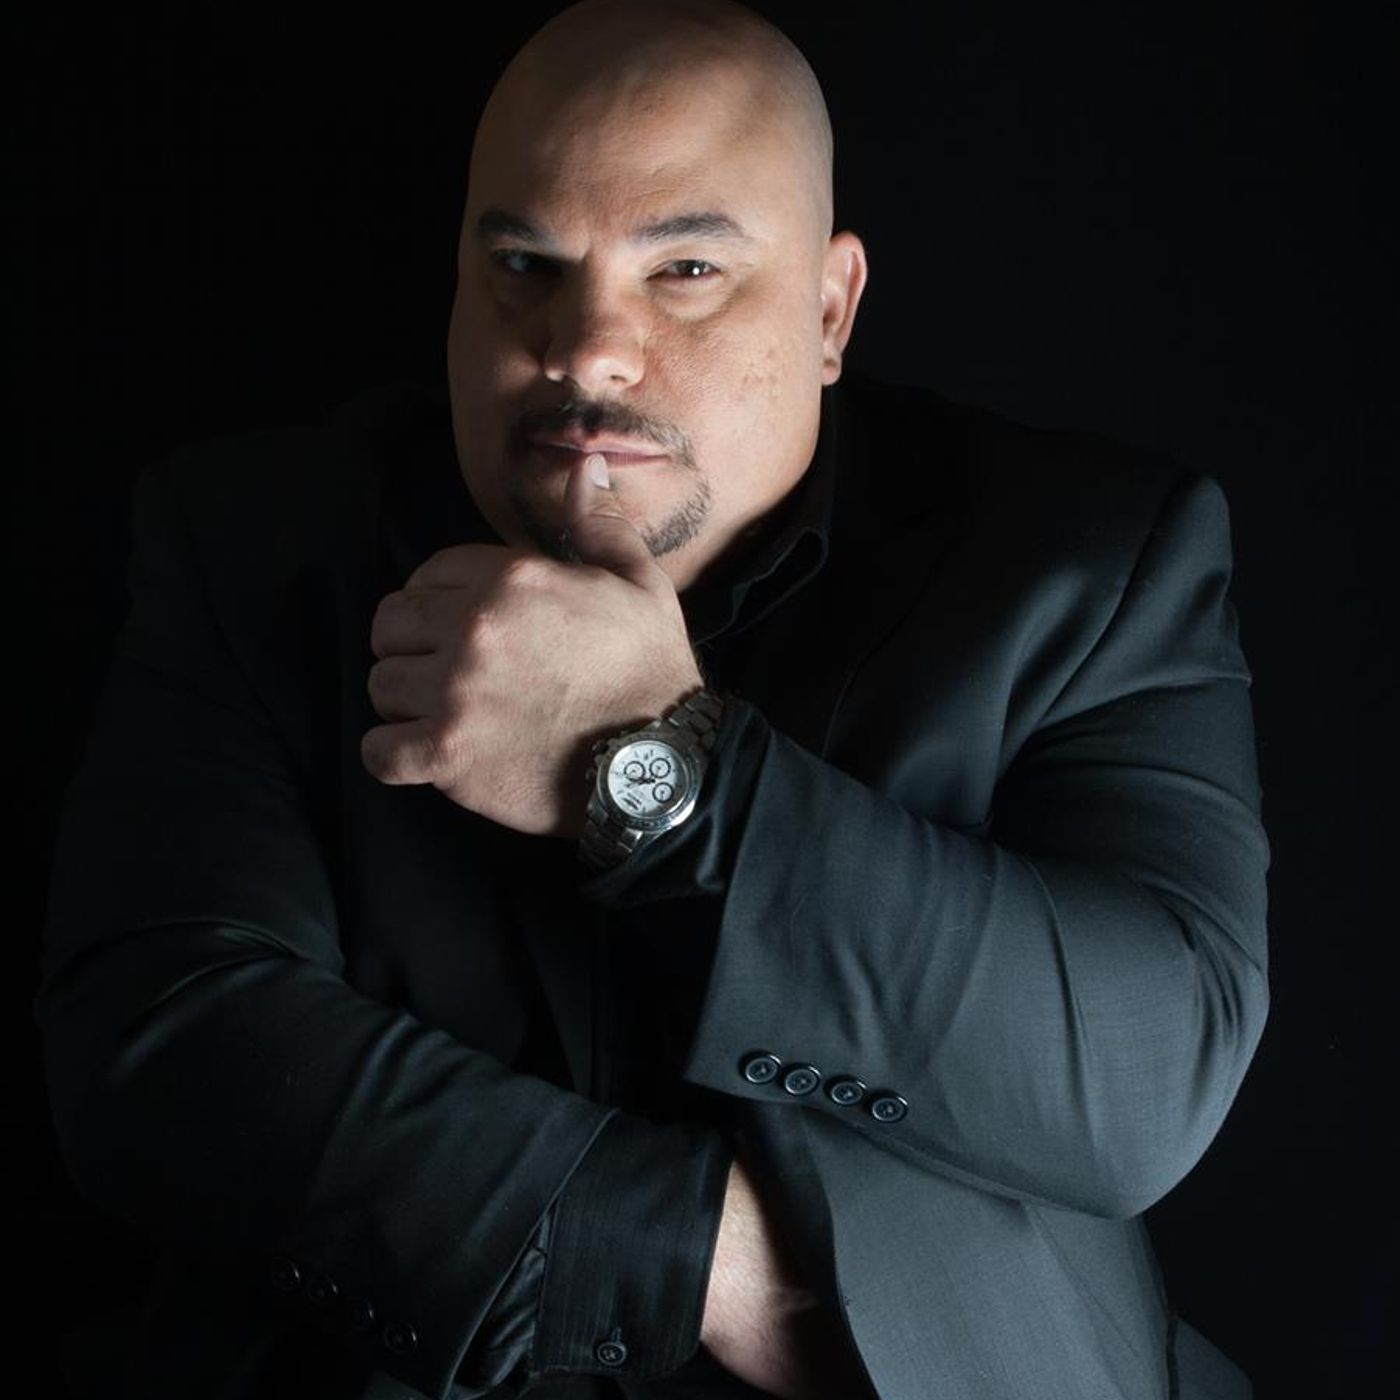 Deeper Than Music Interviews multi-award writer, director and producer Thomas J. Churchill.